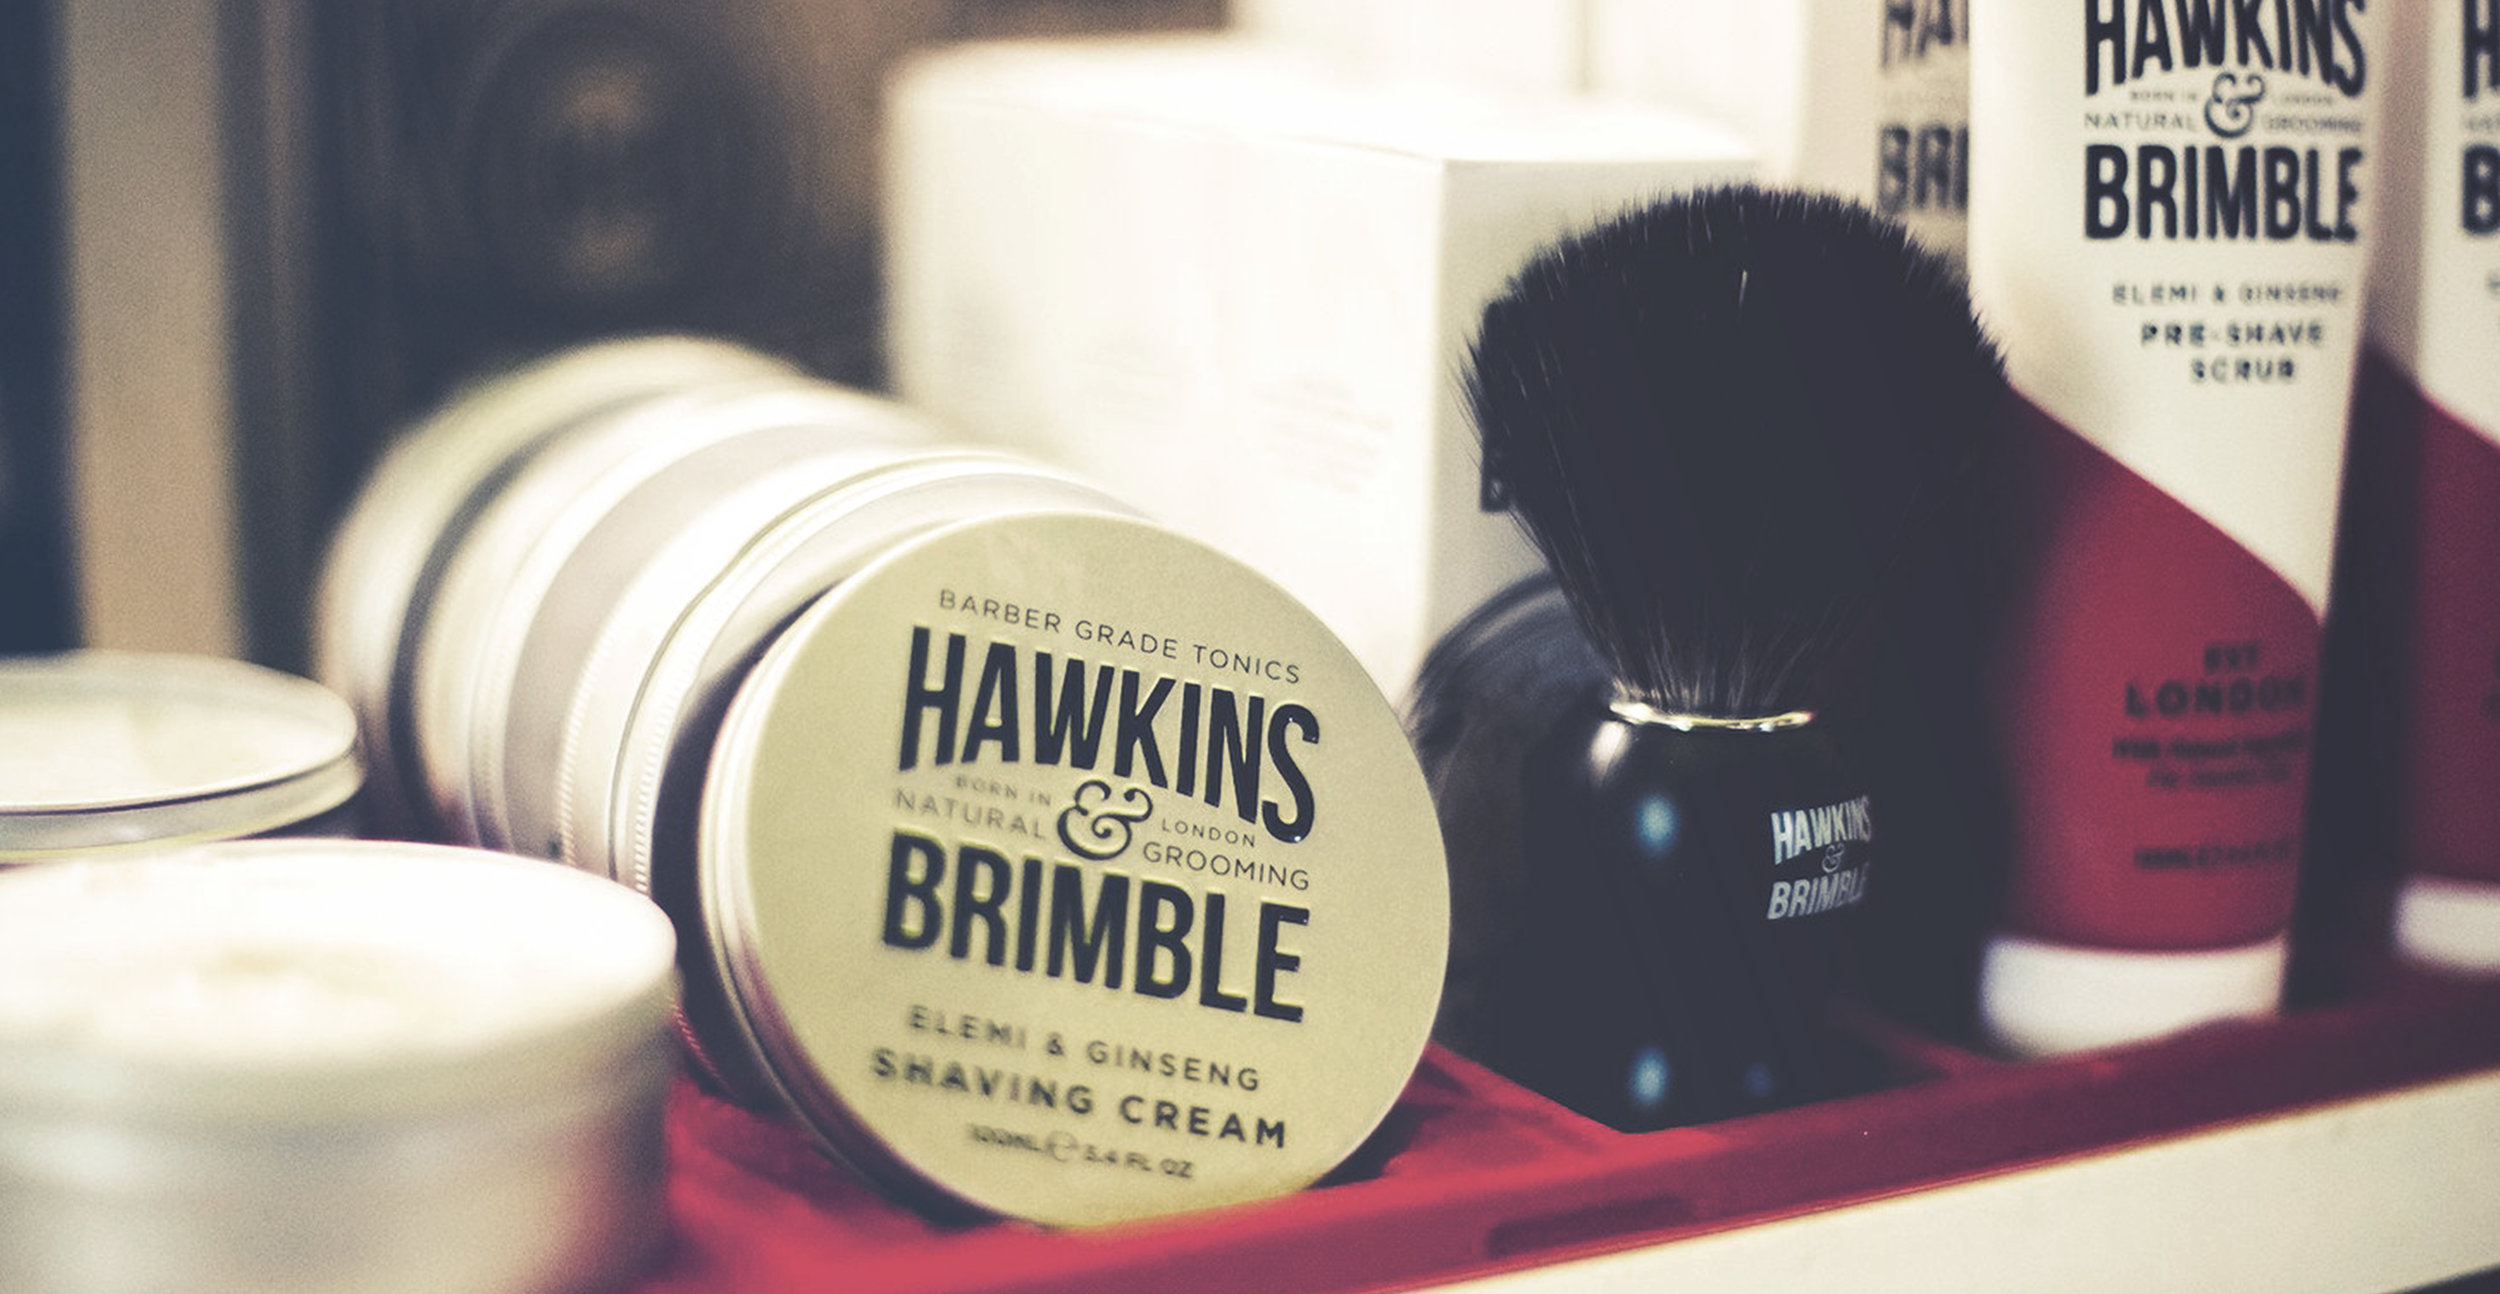 Launching a male grooming brand - The Hawkins & Brimble Barbershop Grooming Range